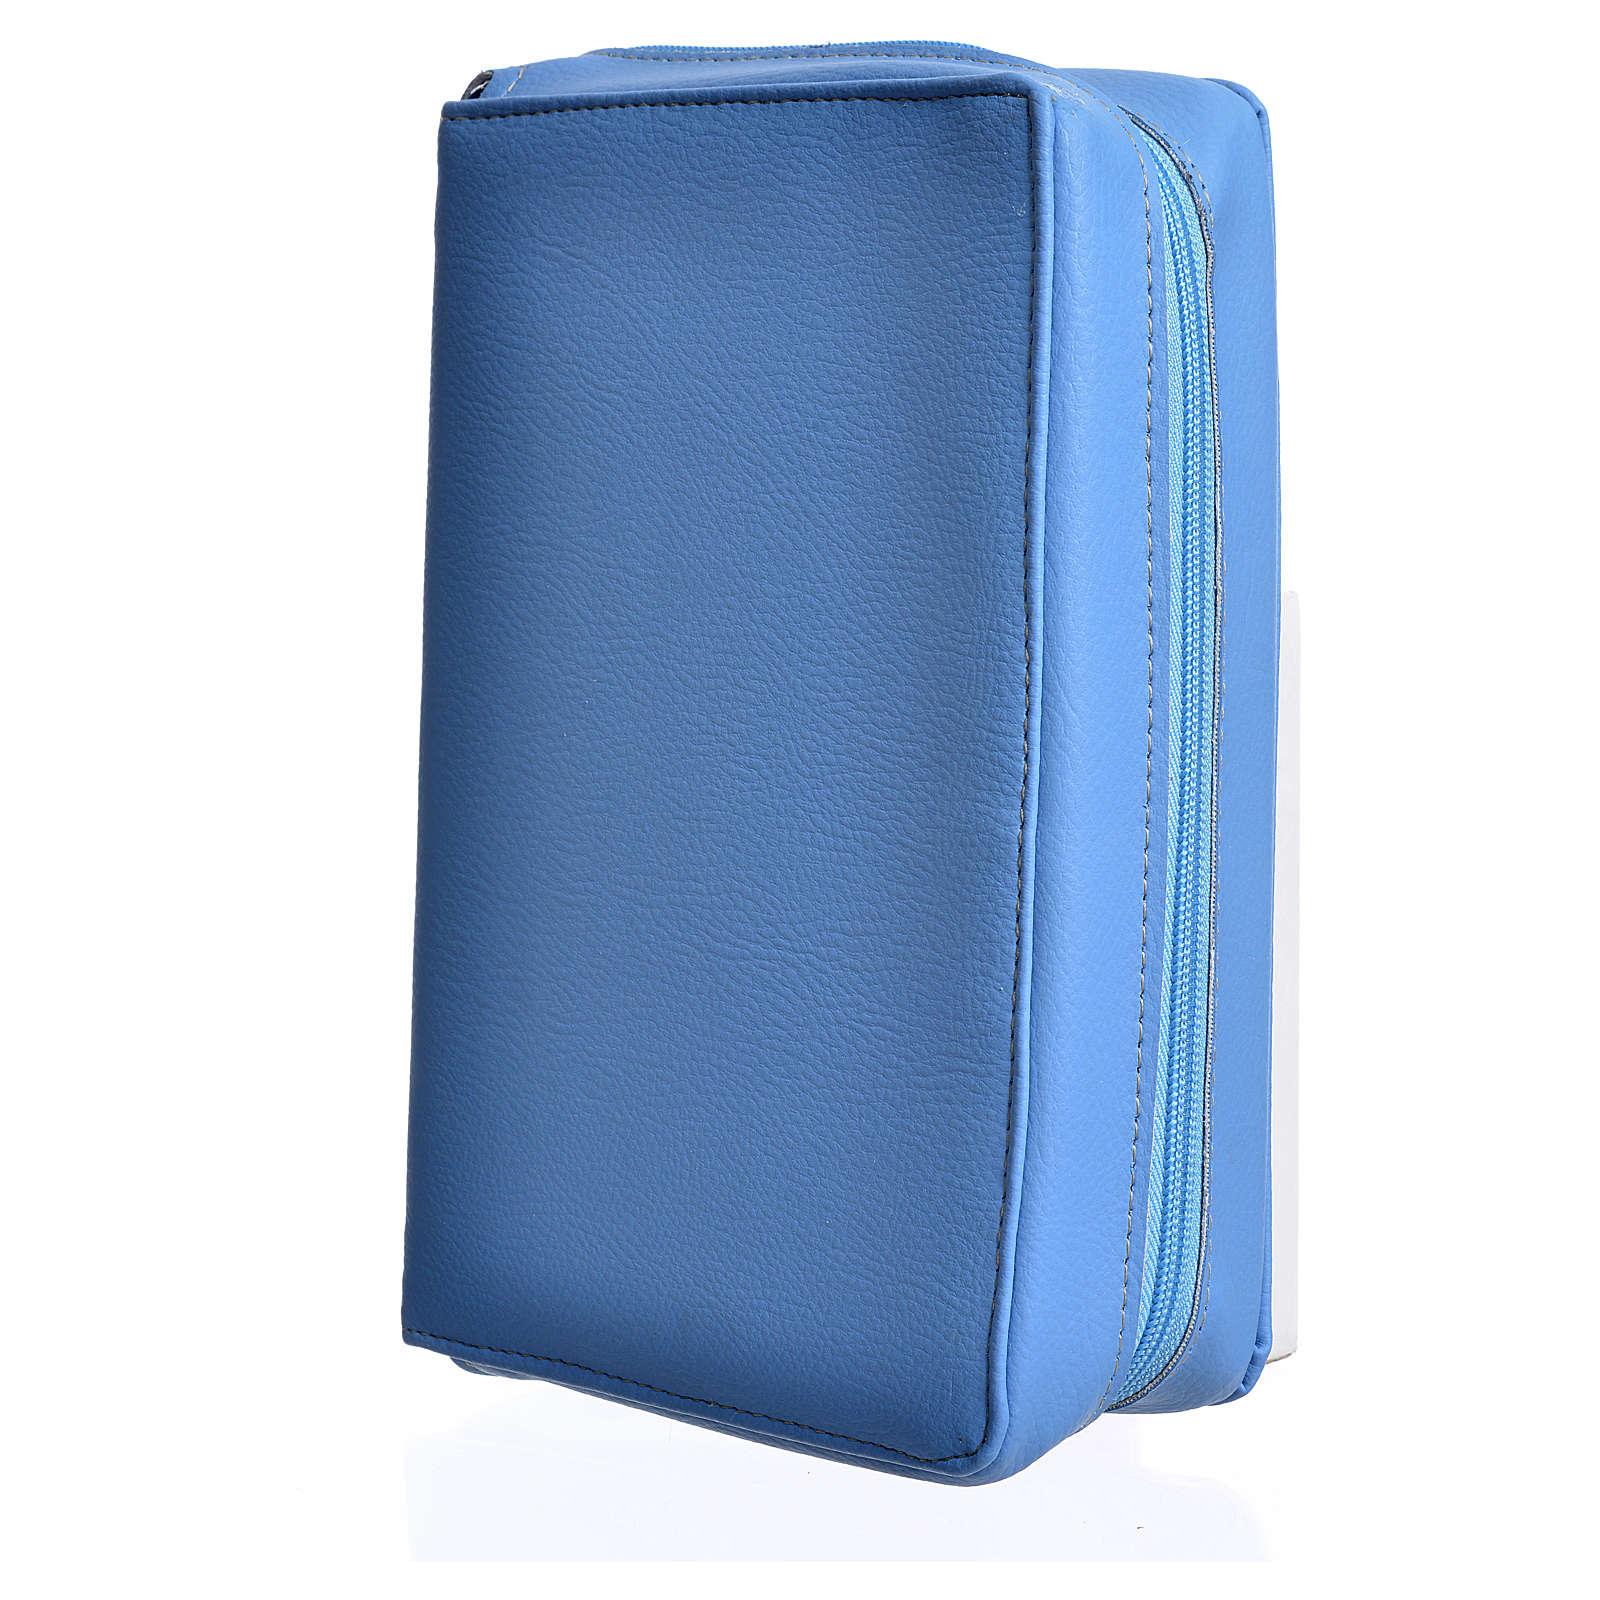 Copertina pelle azzurra Bibbia Via Verità Vita 4